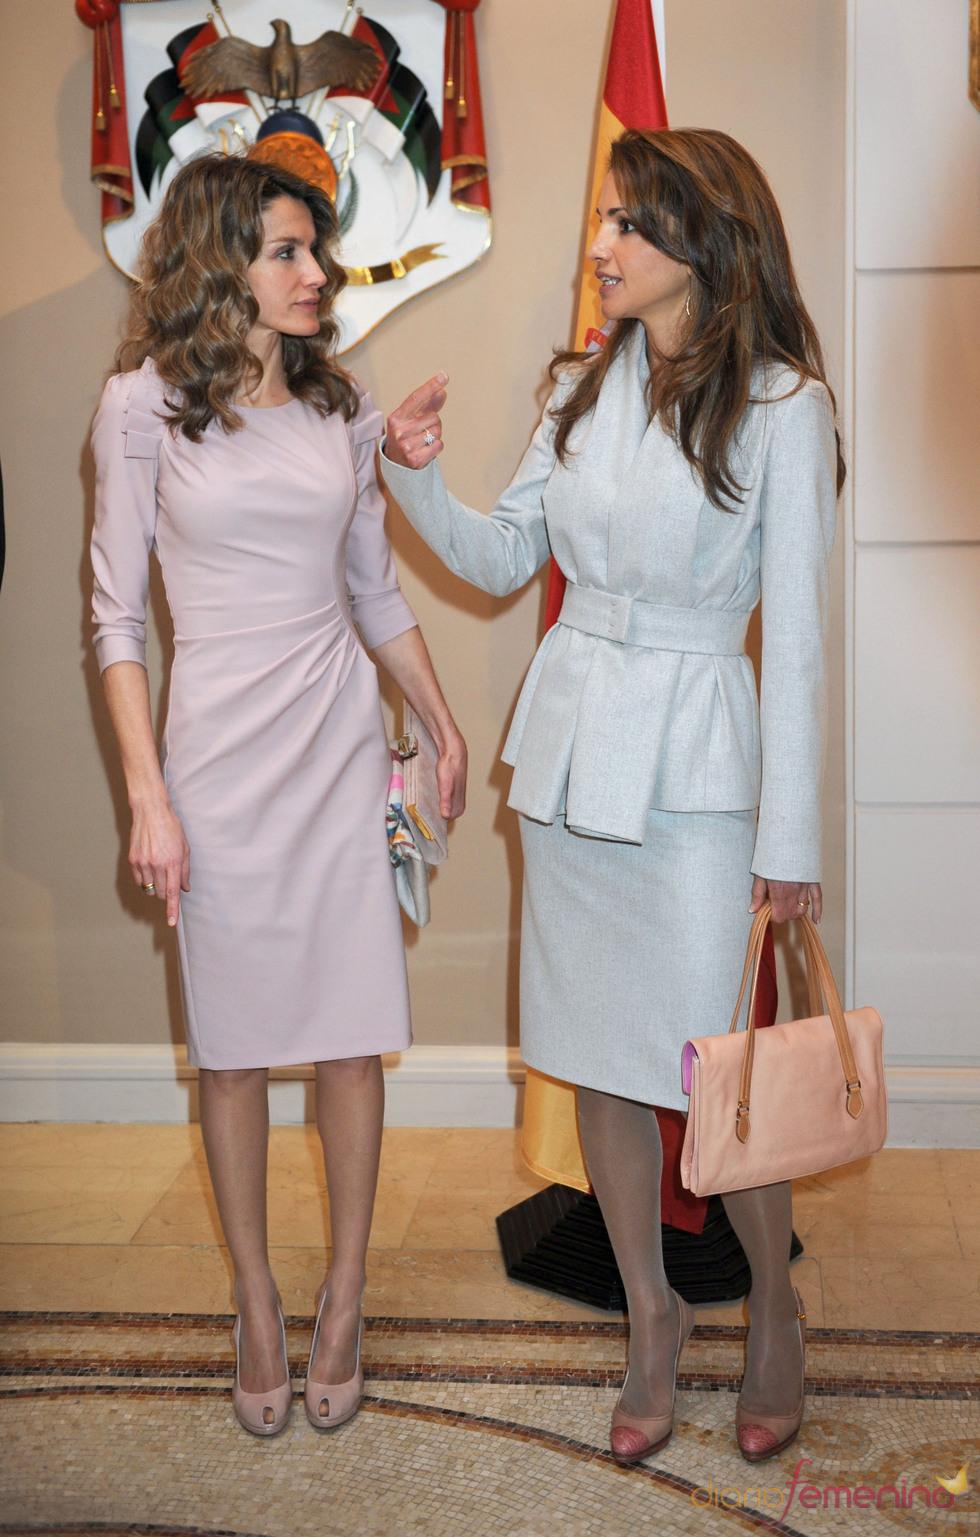 Rania de Jordania y la Princesa Letizia charlan animadamente